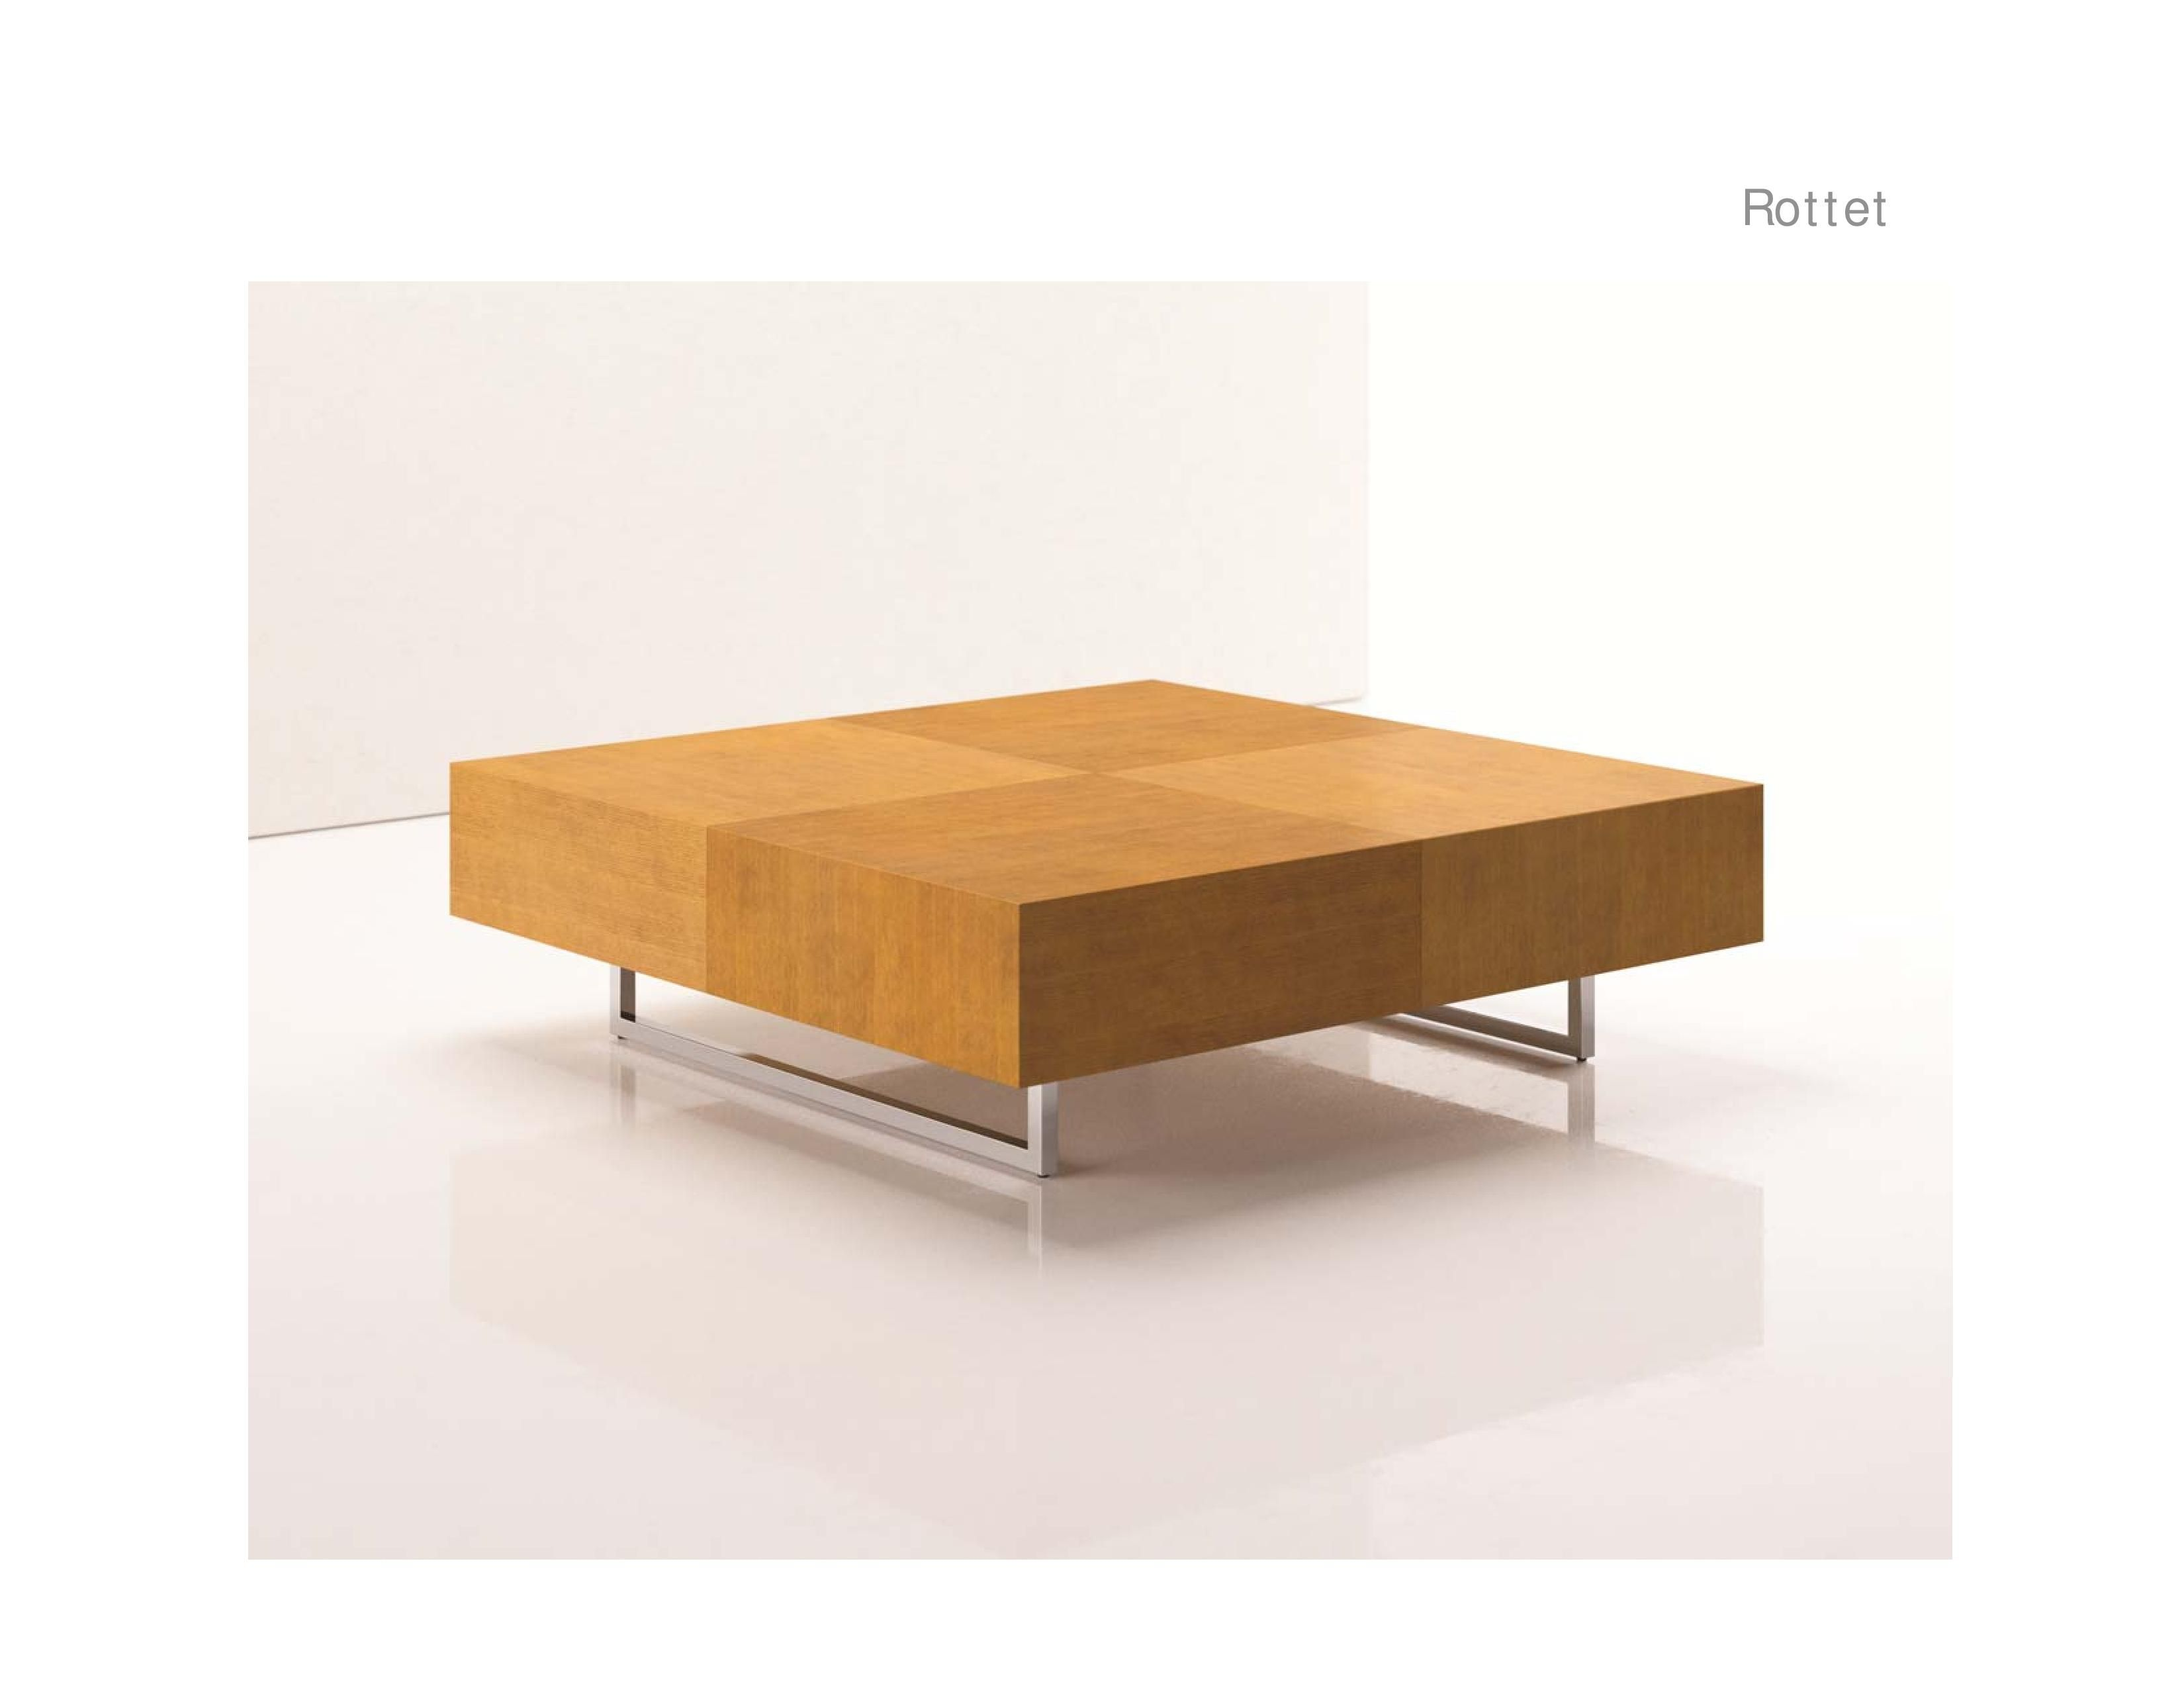 Lr ct110 rottet coffee tablequad sliding wood corner panel lr ct110 rottet coffee tablequad sliding wood corner panel matching concealed storage trays geotapseo Choice Image